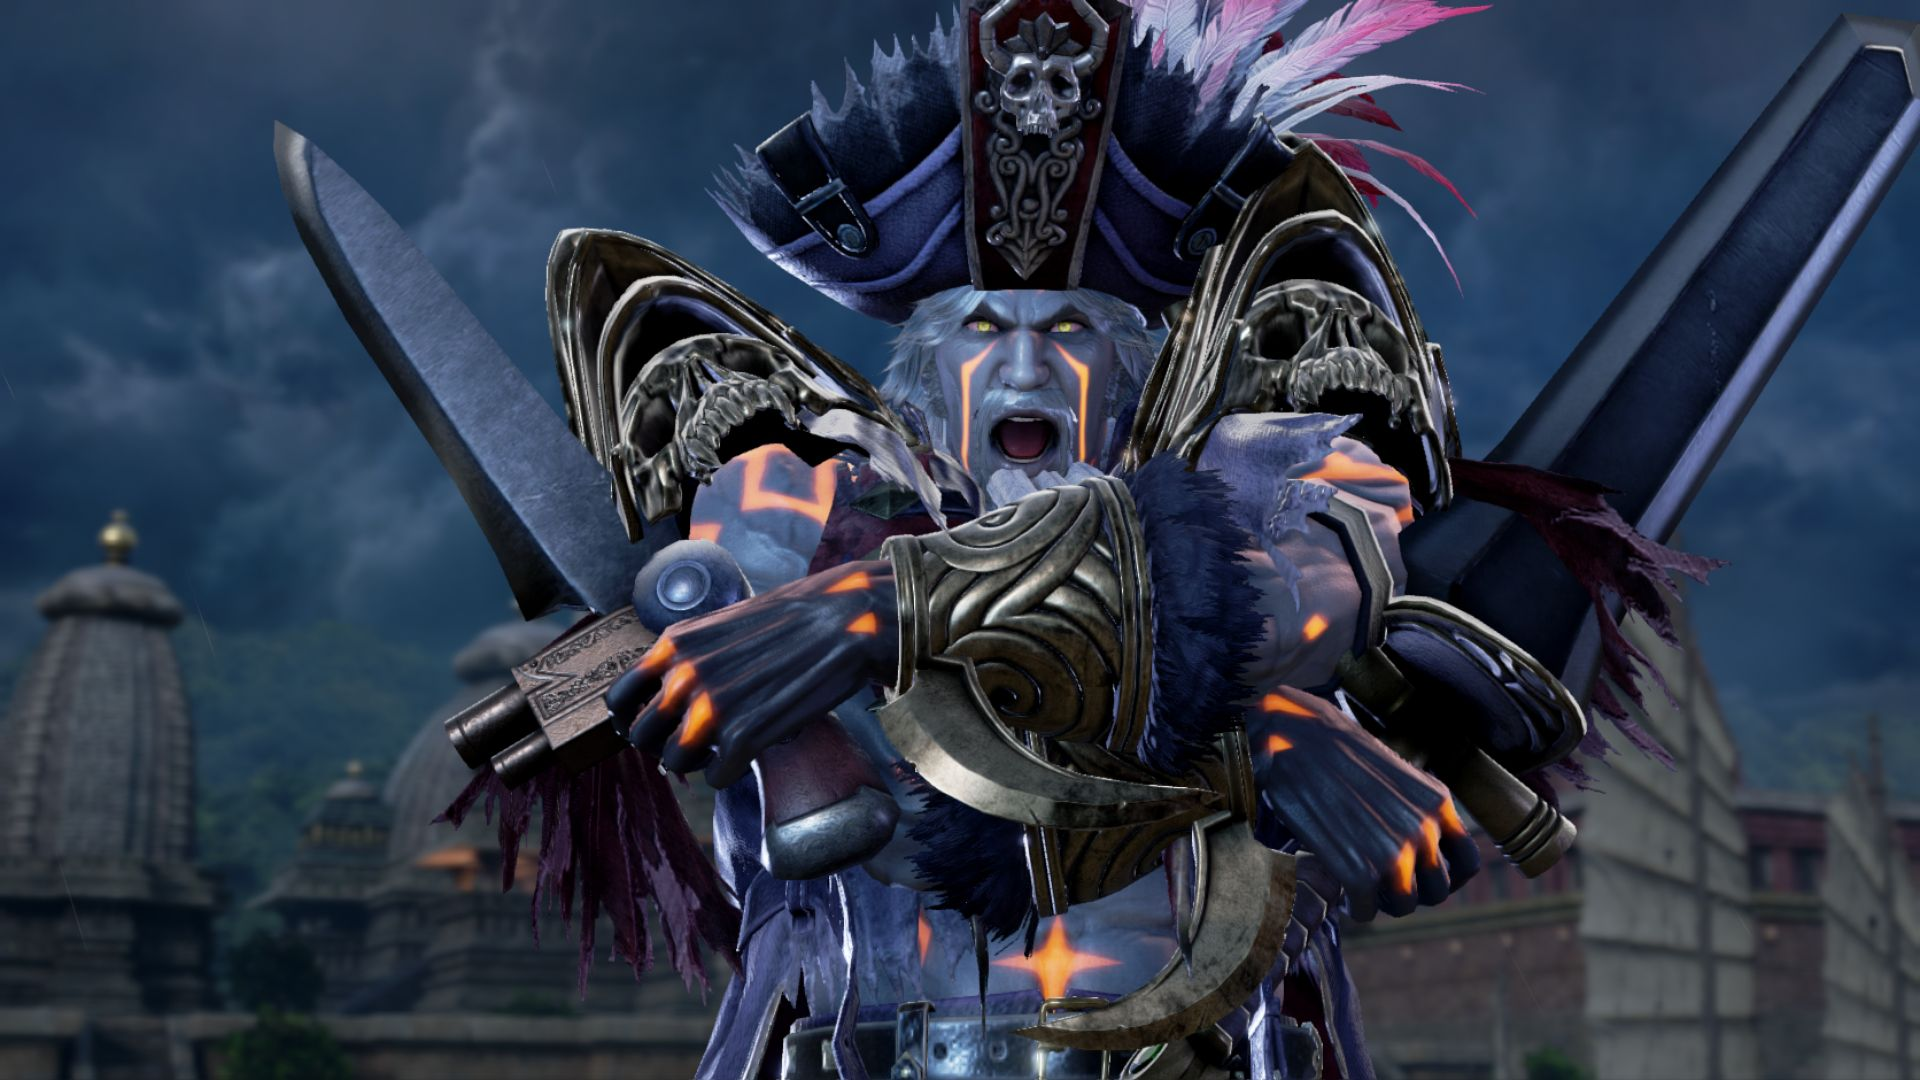 Cervantes confirmado oficialmente para Soulcalibur VI